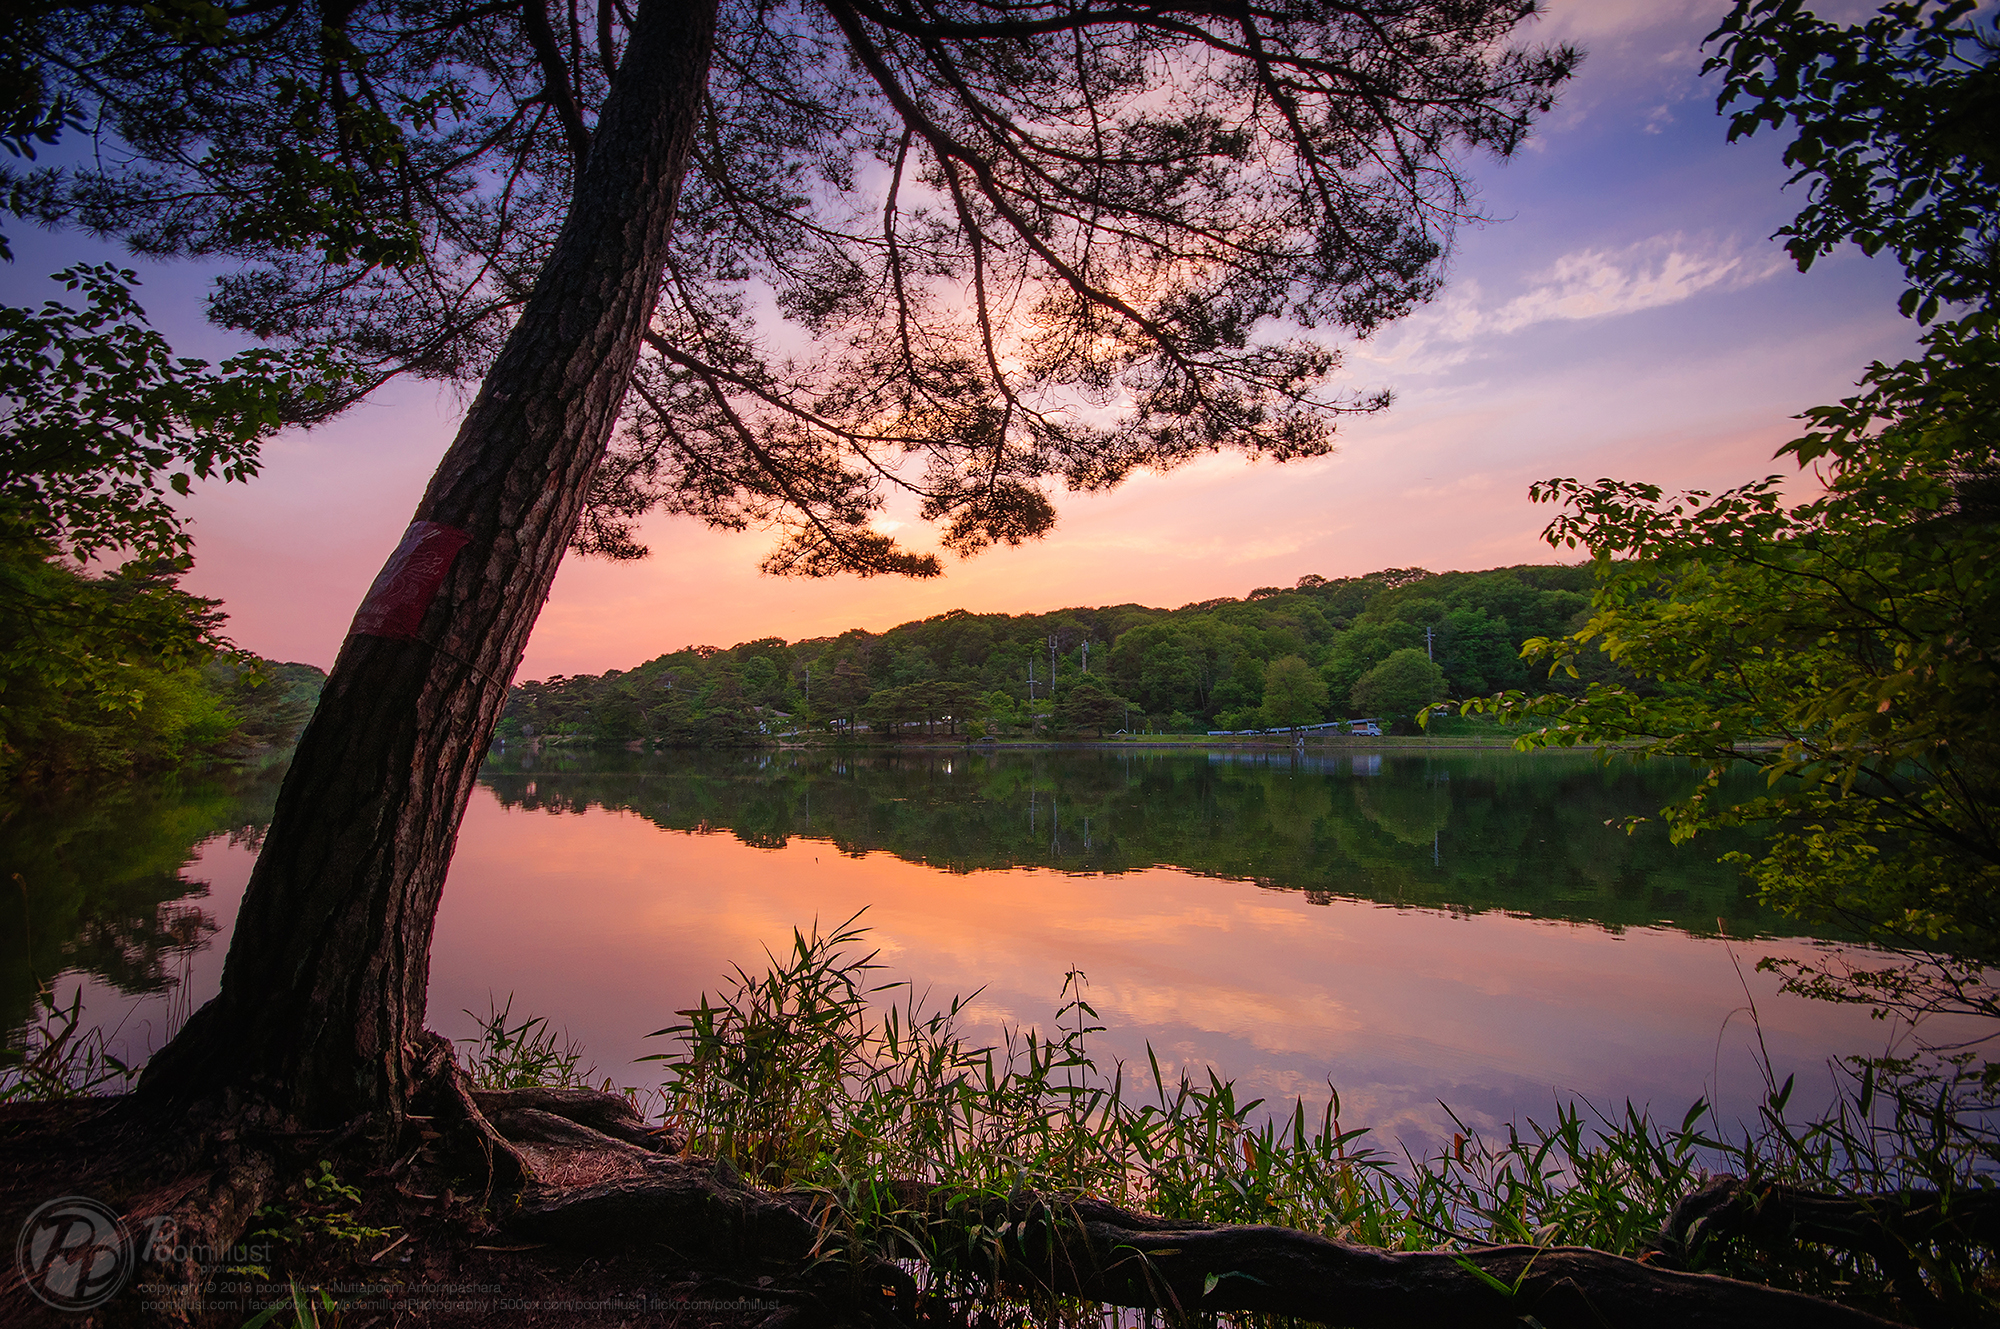 Peaceful pond photo